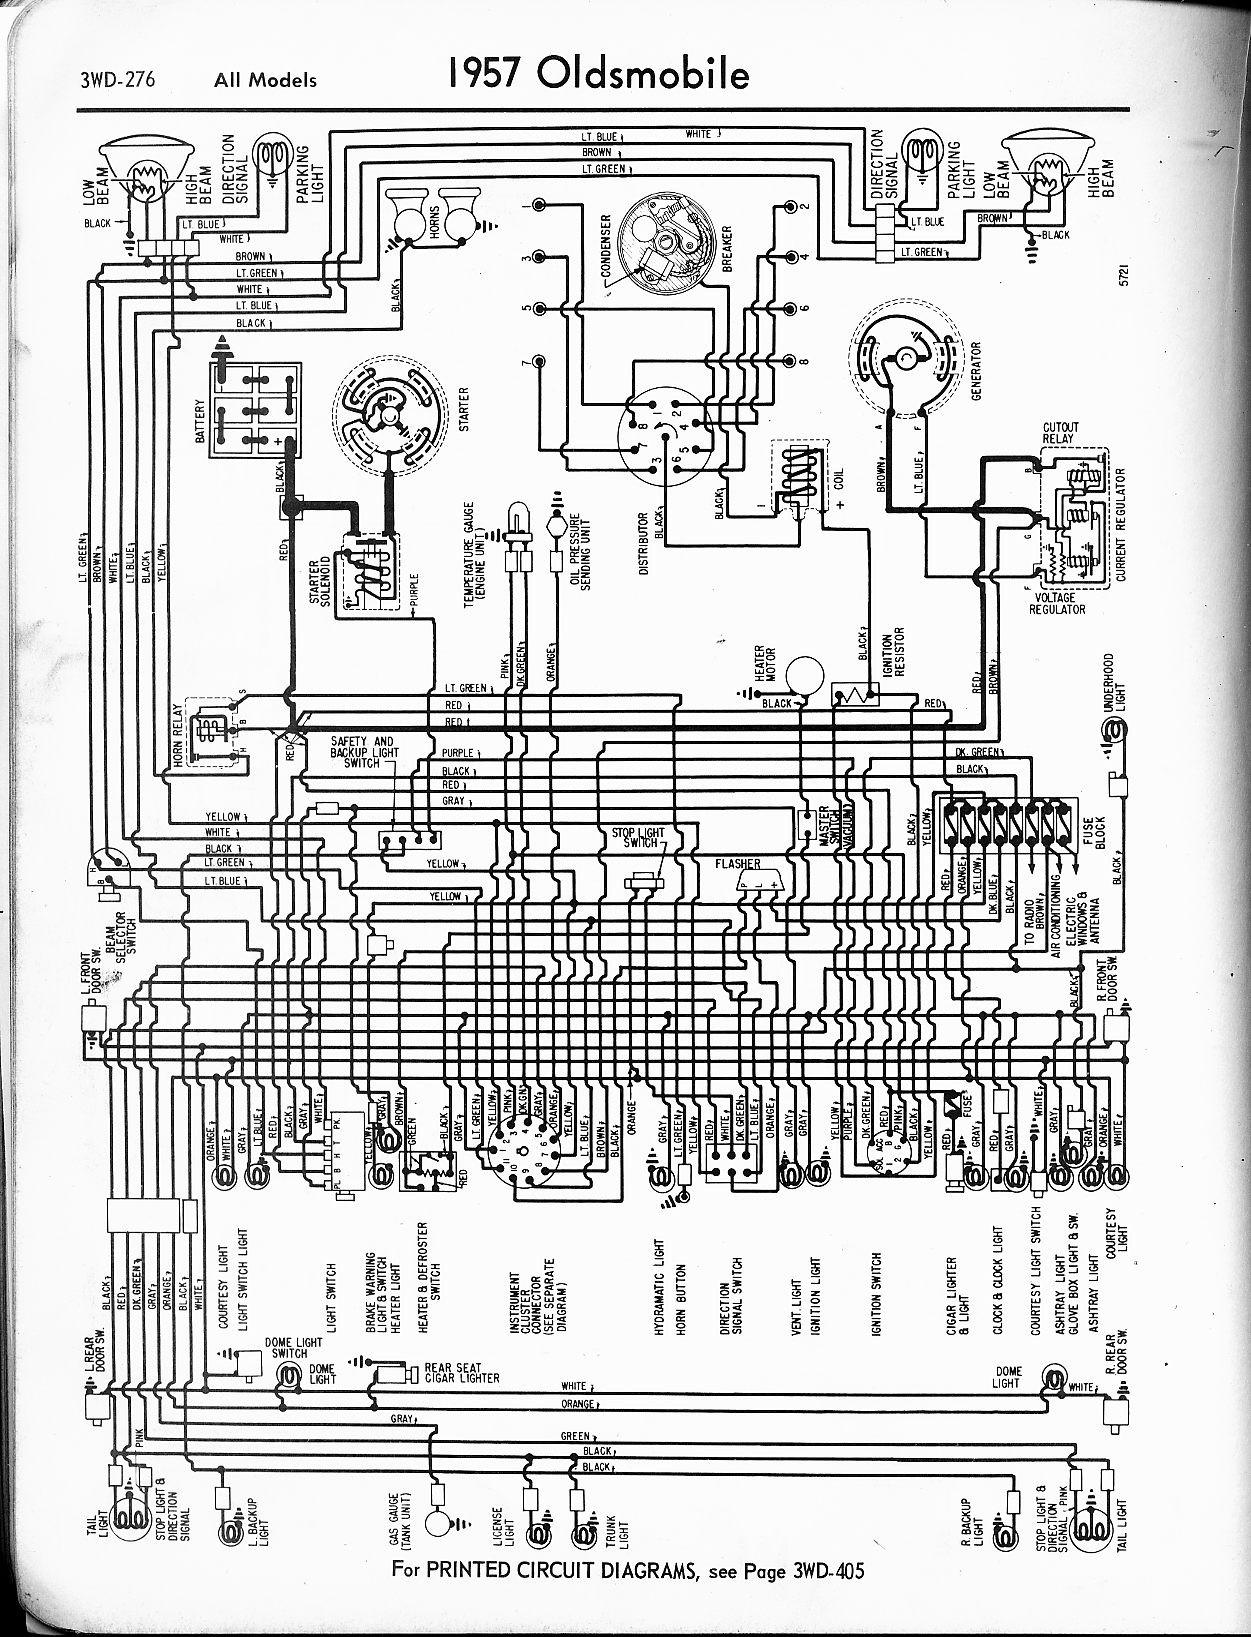 Vw Passat Engine Parts Diagram Diagram Moreover 1994 Oldsmobile Cutlass Supreme Engine Parts Of Vw Passat Engine Parts Diagram